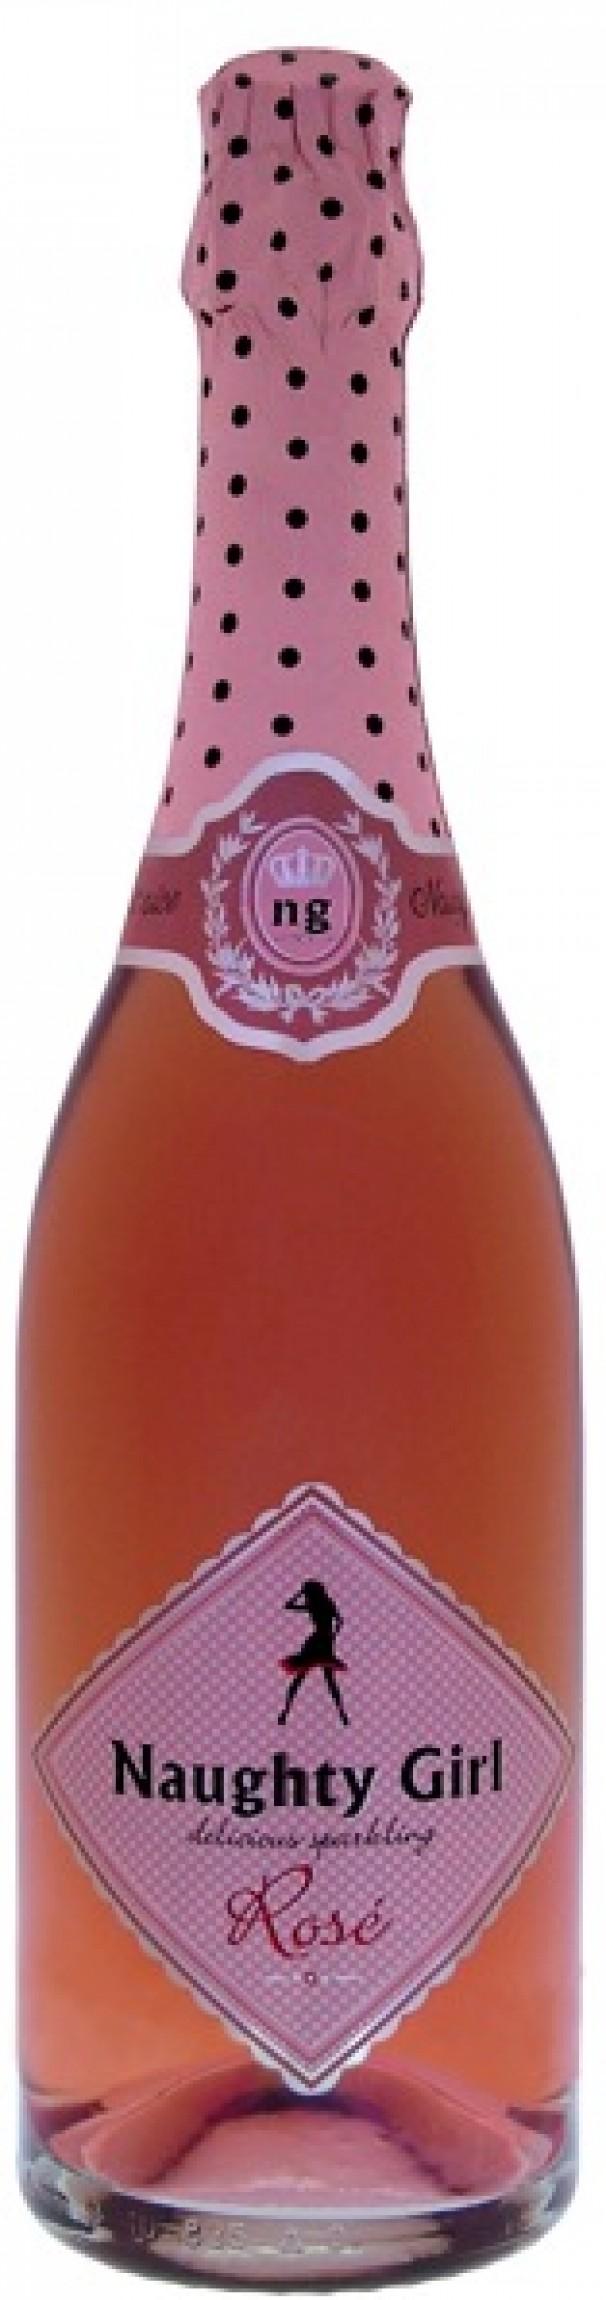 Naughty Girl – Sparkling Wine